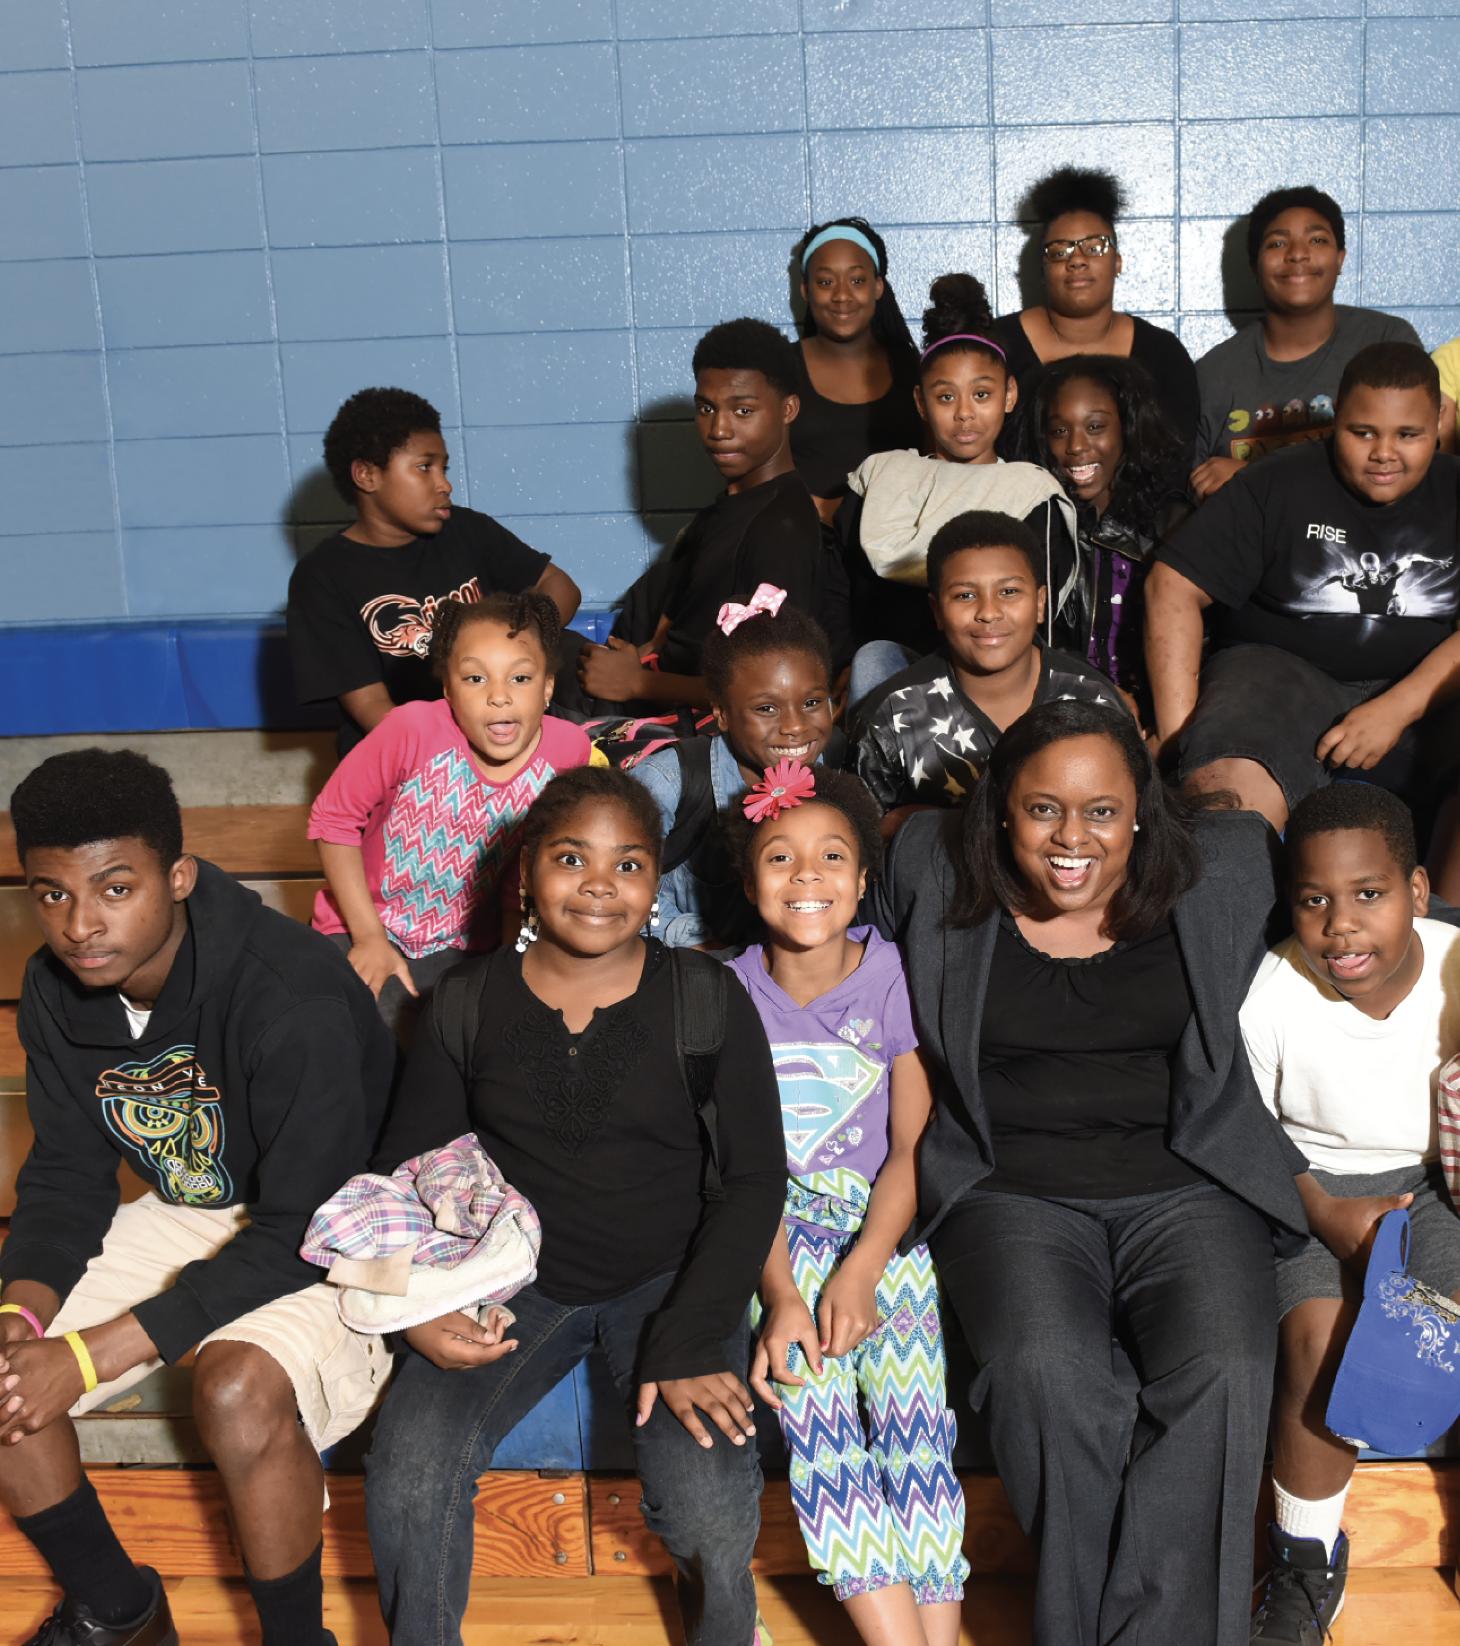 Liz Huntley with group of kids